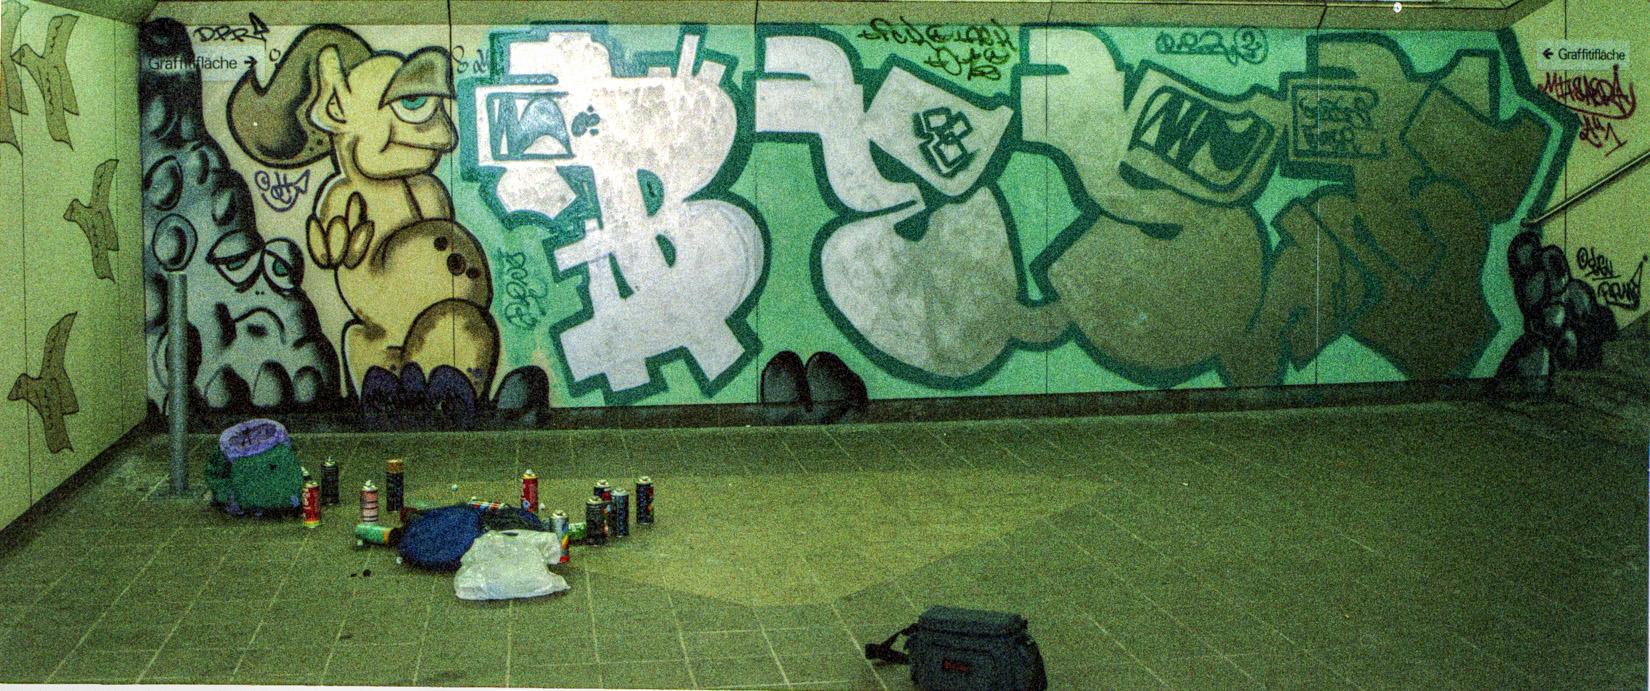 Frankfurt_Graffiti_1988_1989_H88_FRC (2 von 25)